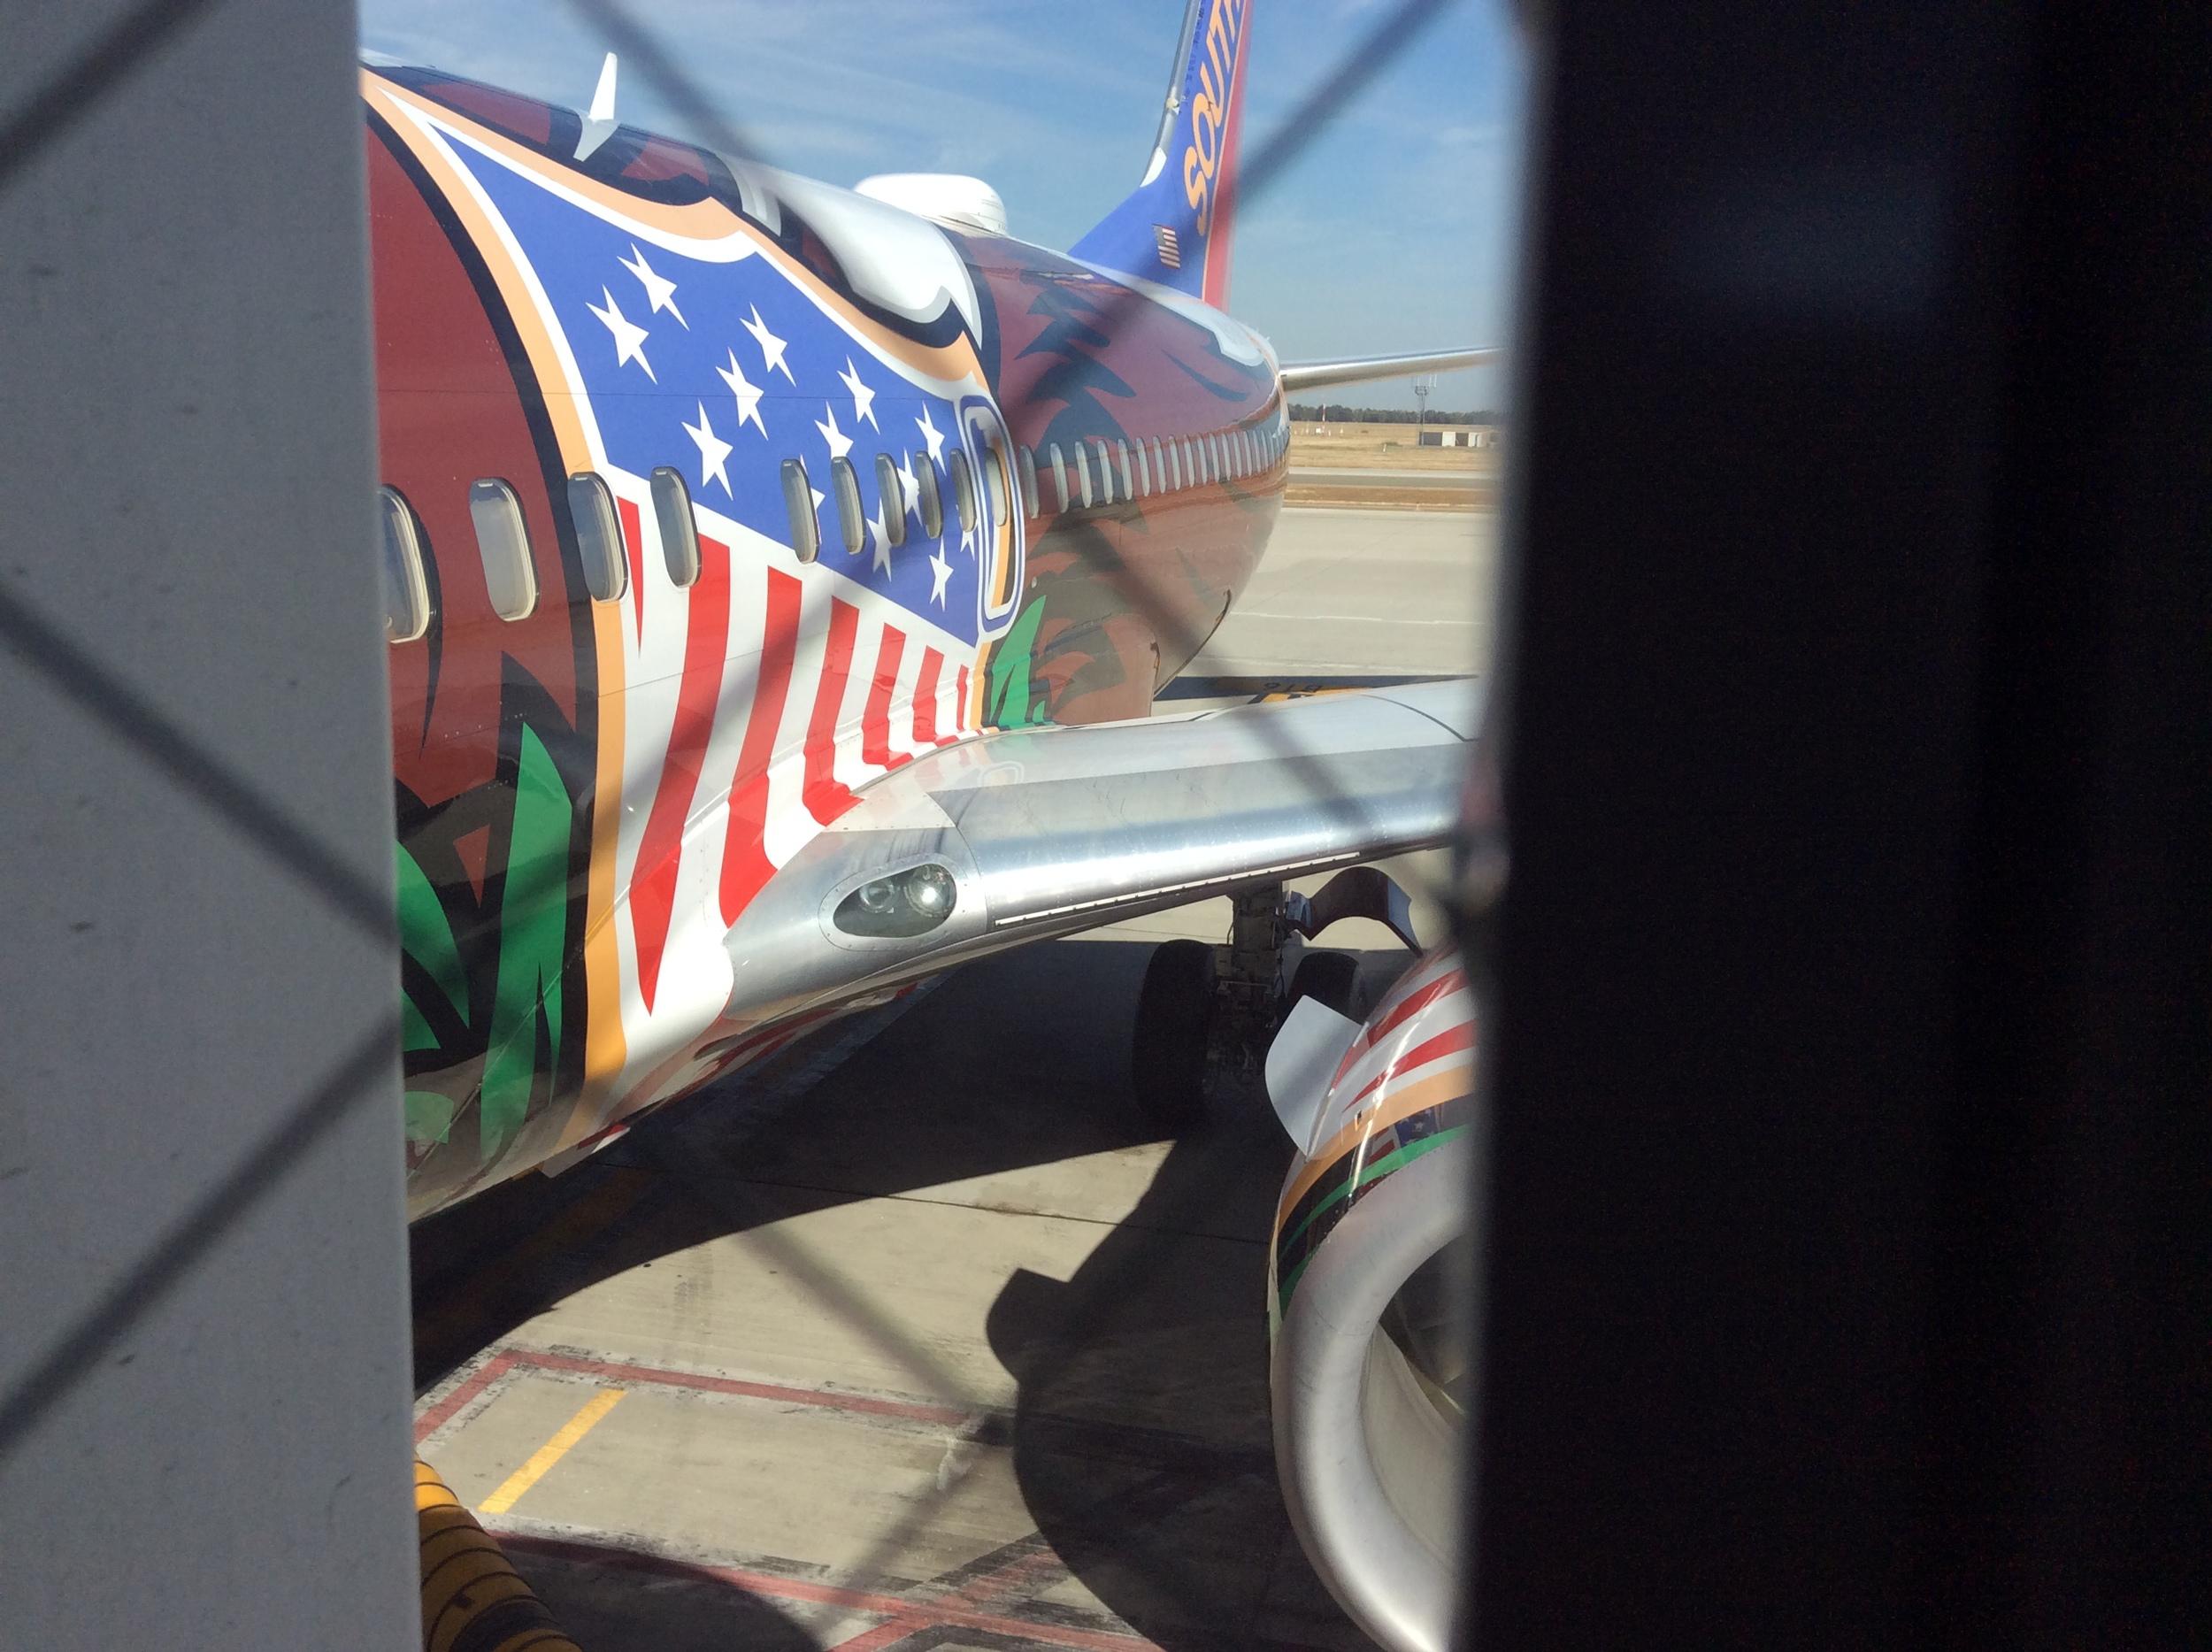 The Southwest Illinois One plane